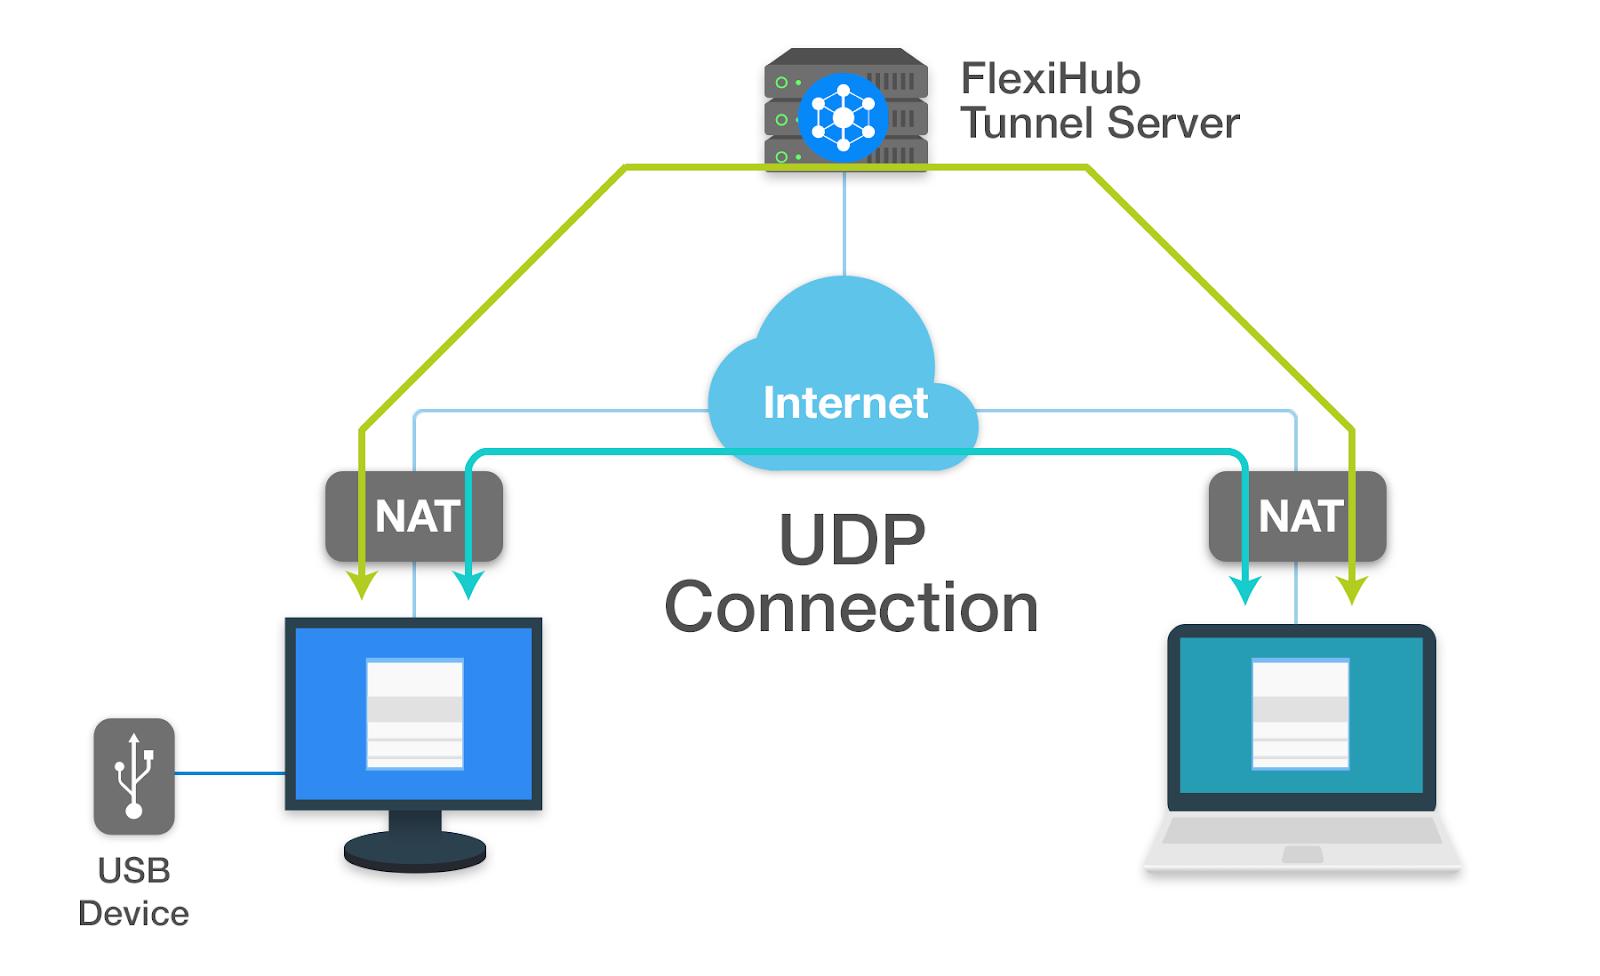 UDP connection